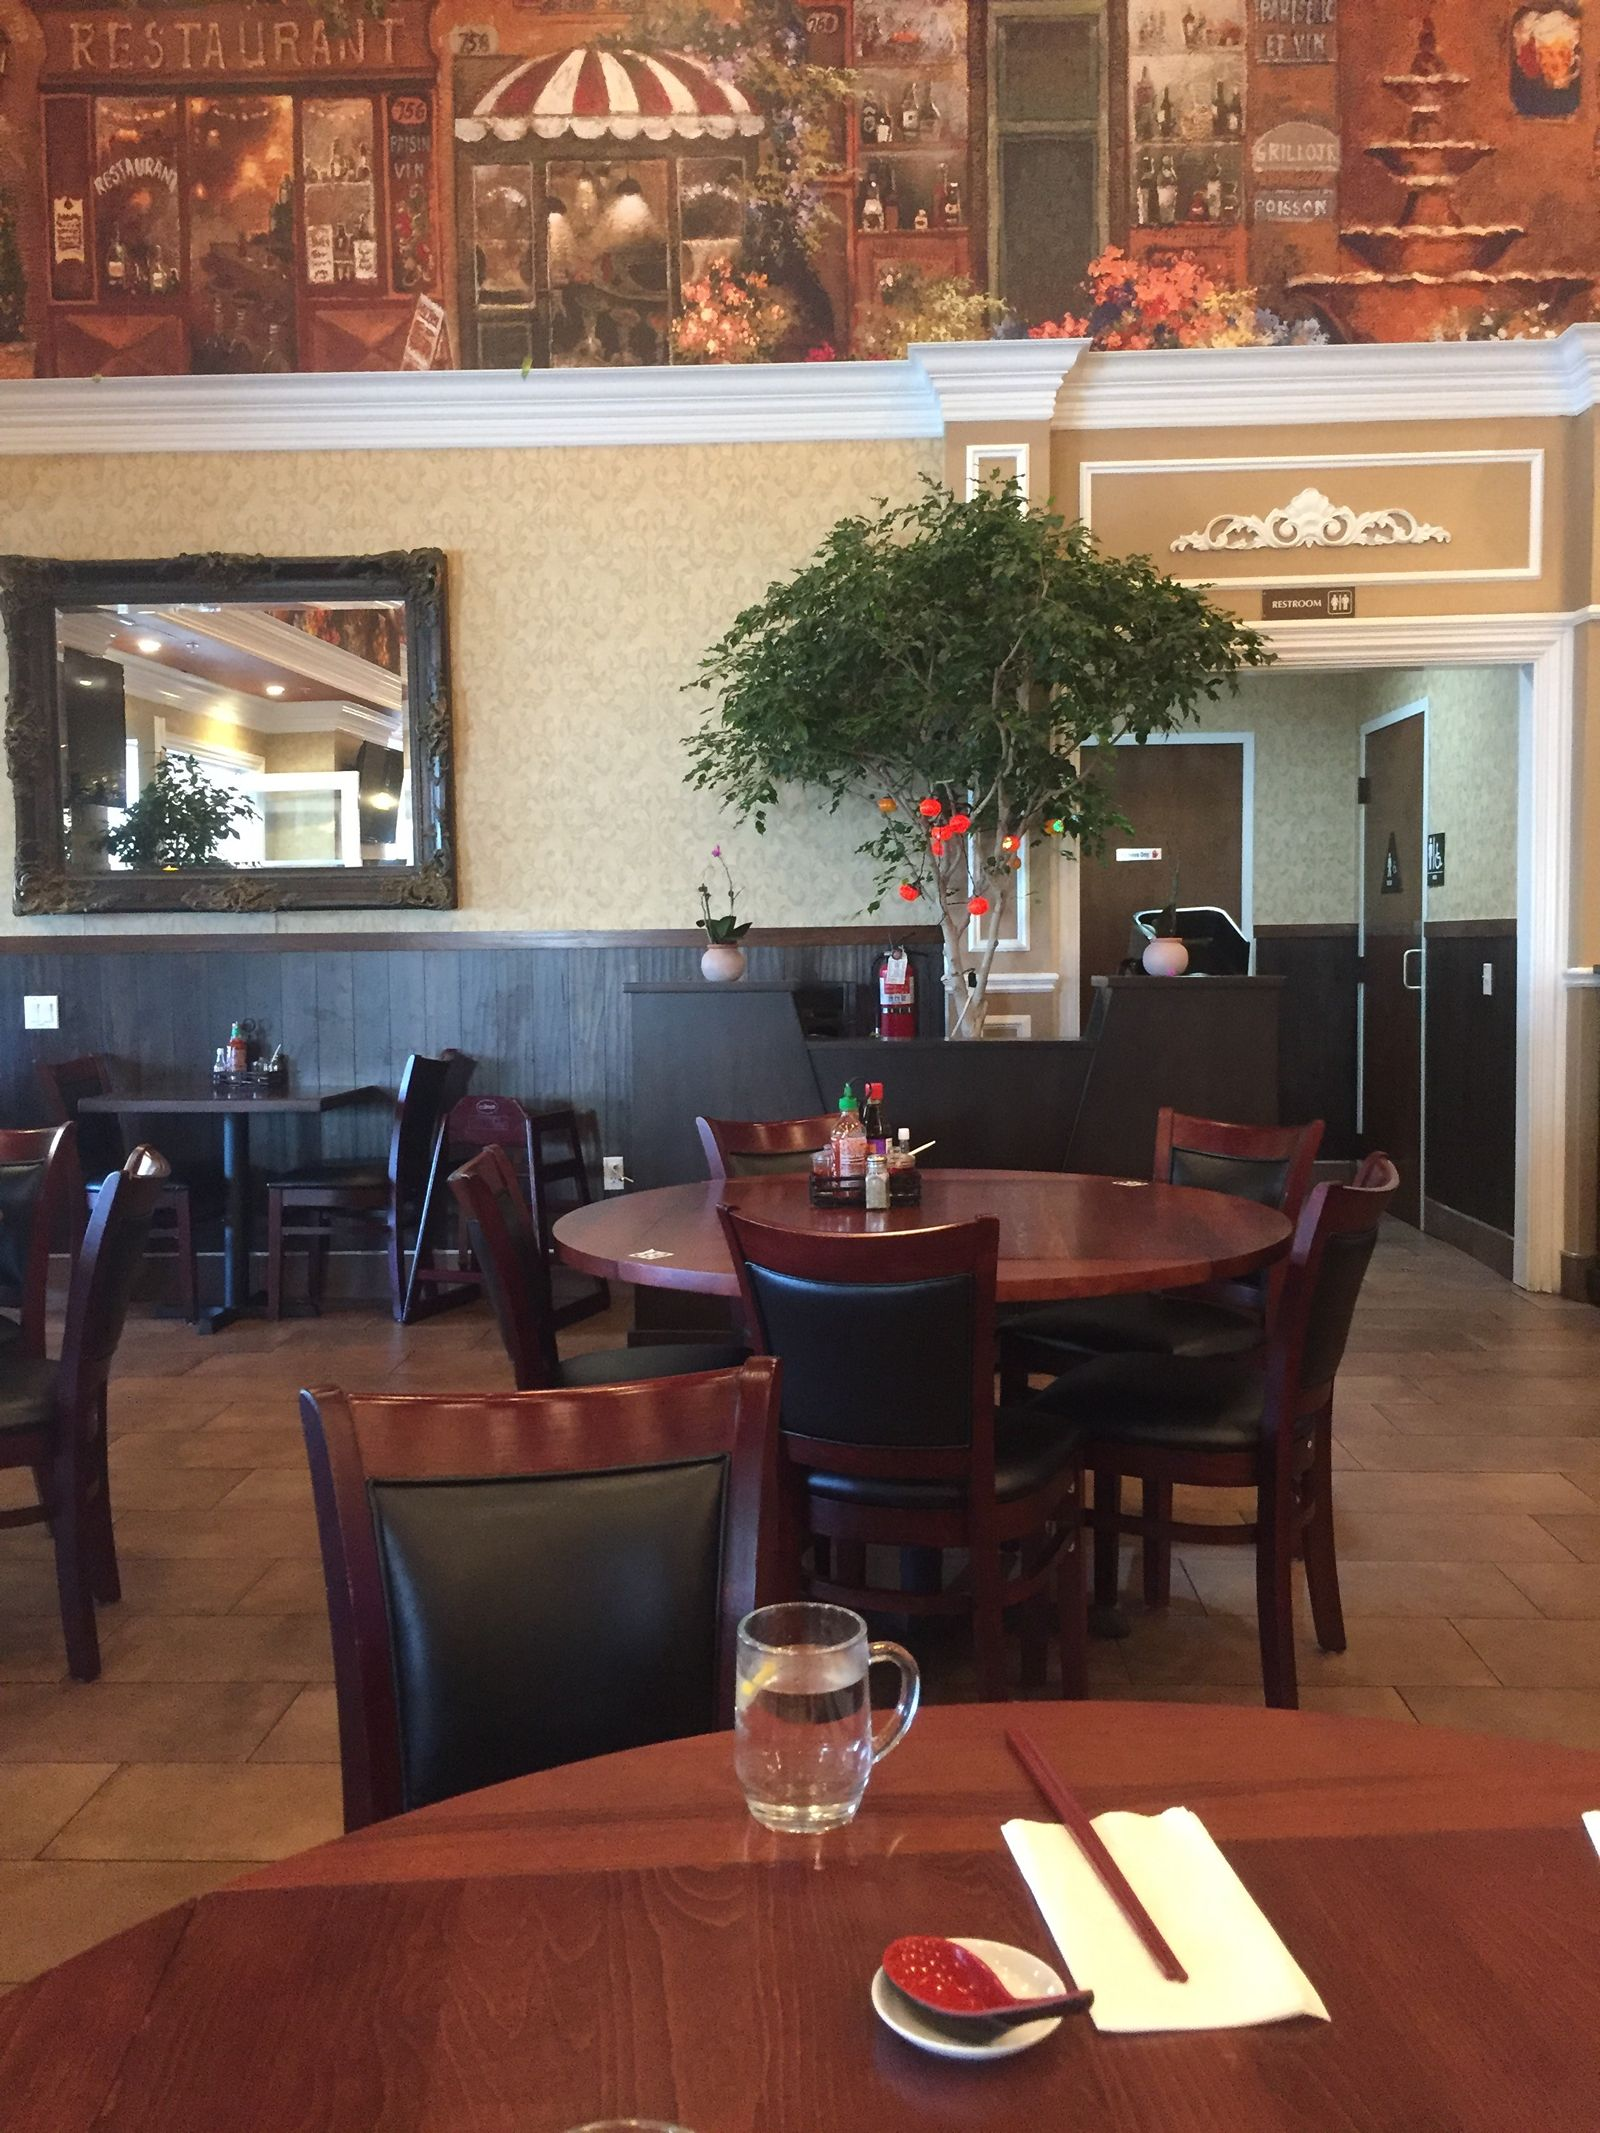 RestaurantFurniture.net Presents a New Line of US Made Restaurant Tables